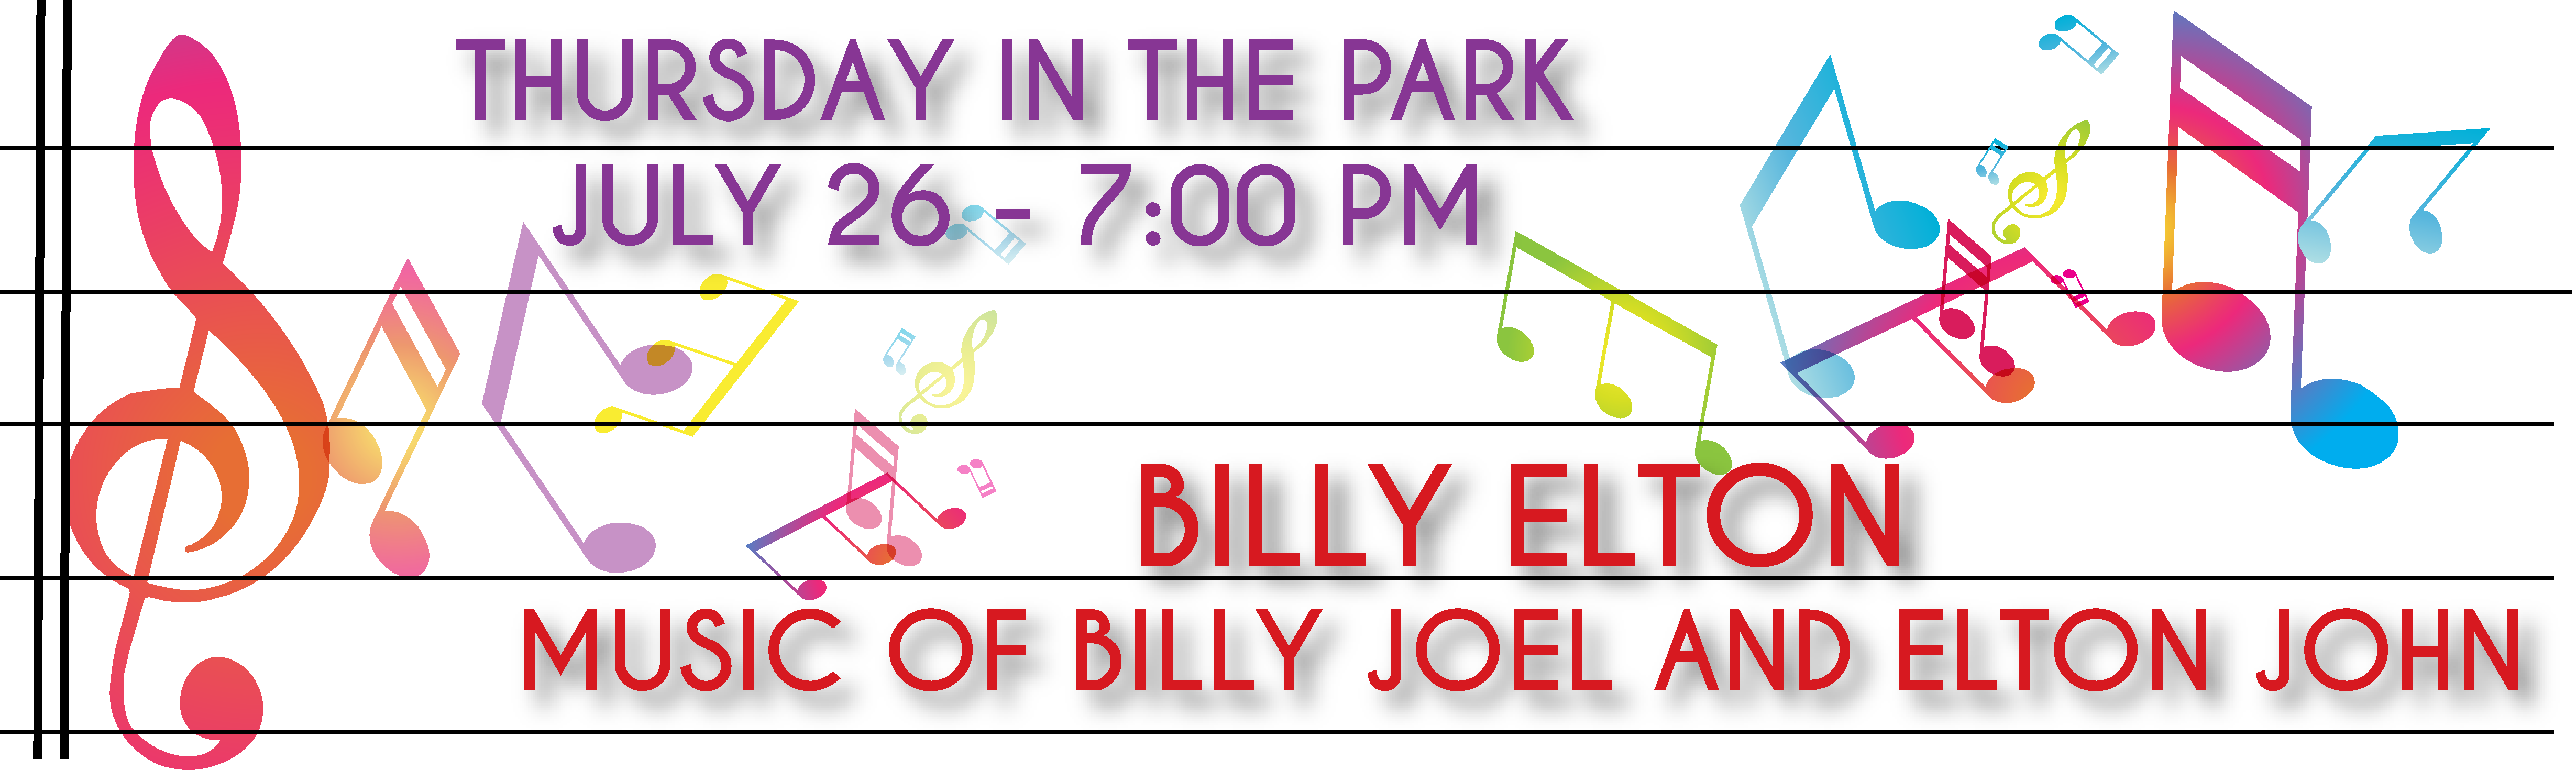 0726 Thursdays in the Park